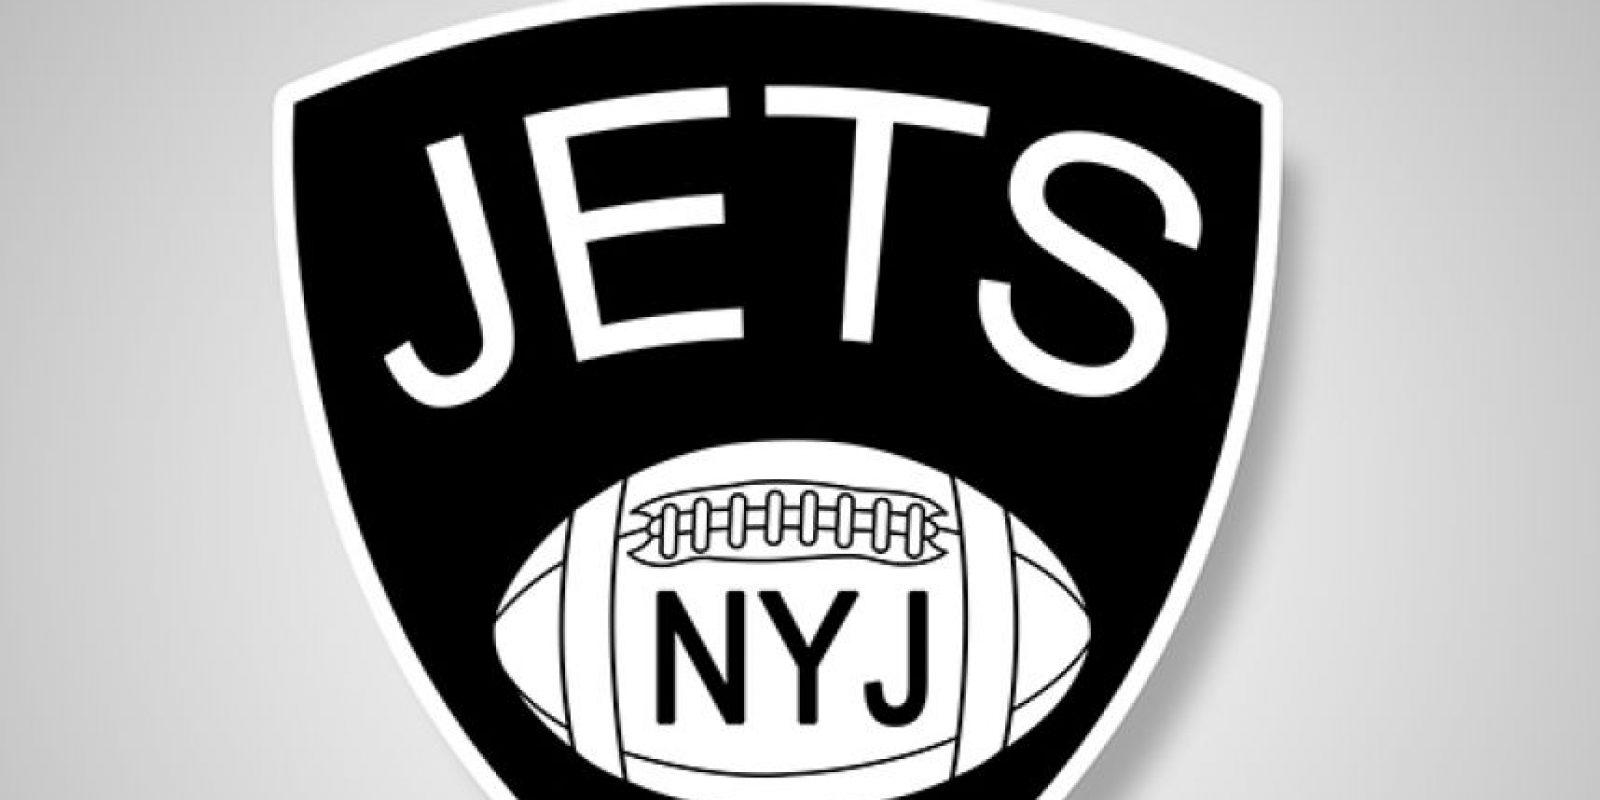 New York Jets y Brooklyn Nets Foto:DaylySnark